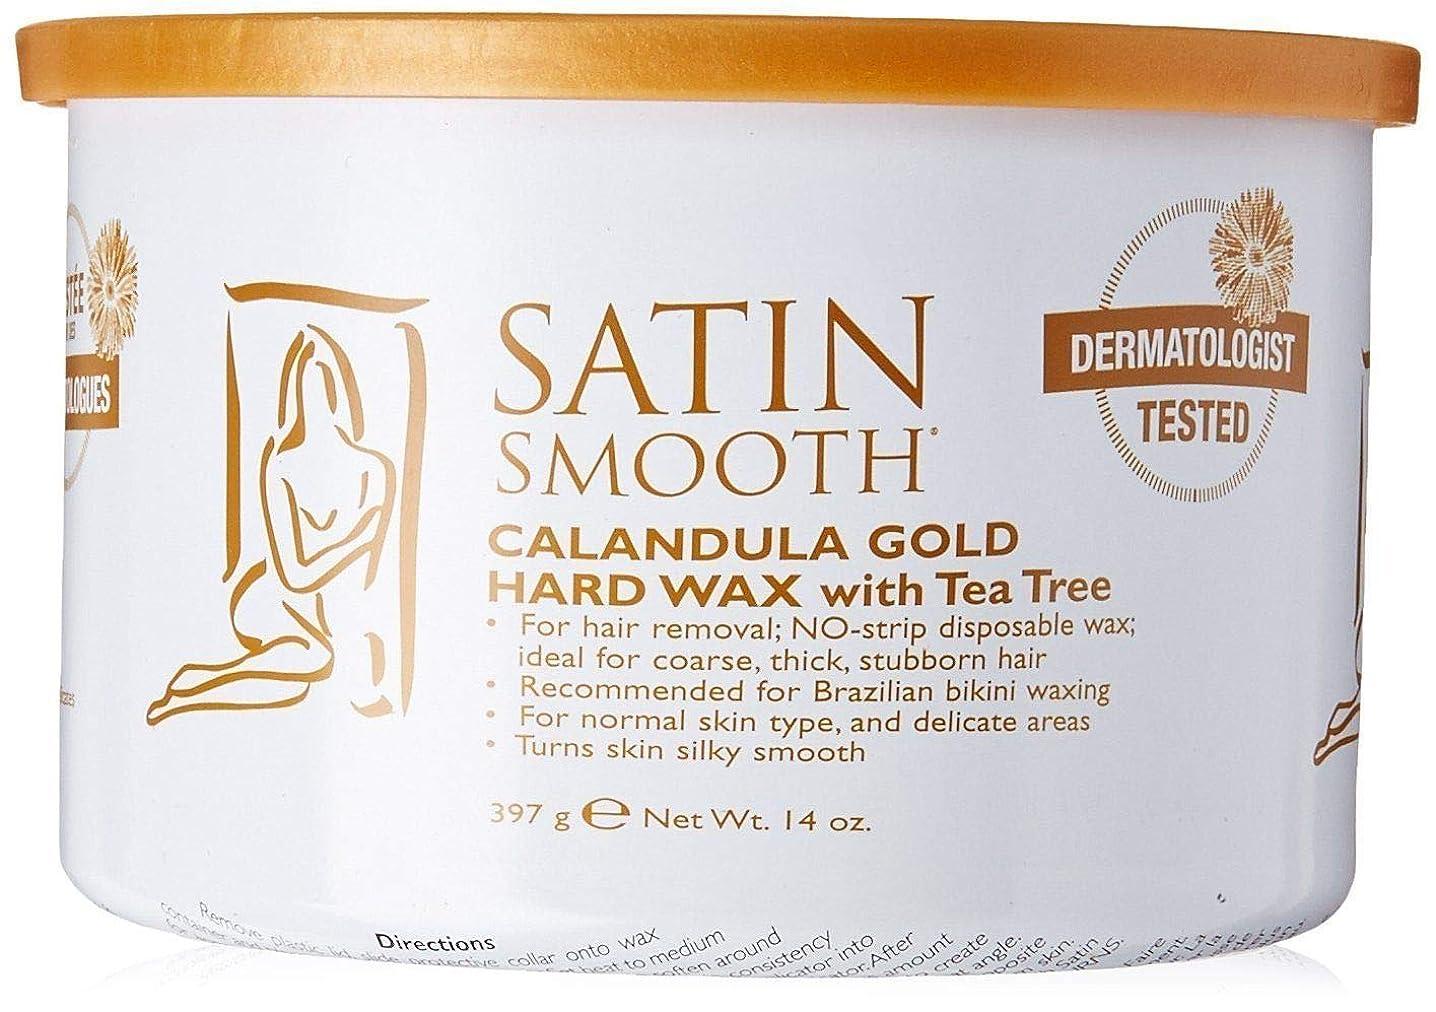 Satin Smooth Calendula Gold Wax 6 Pack